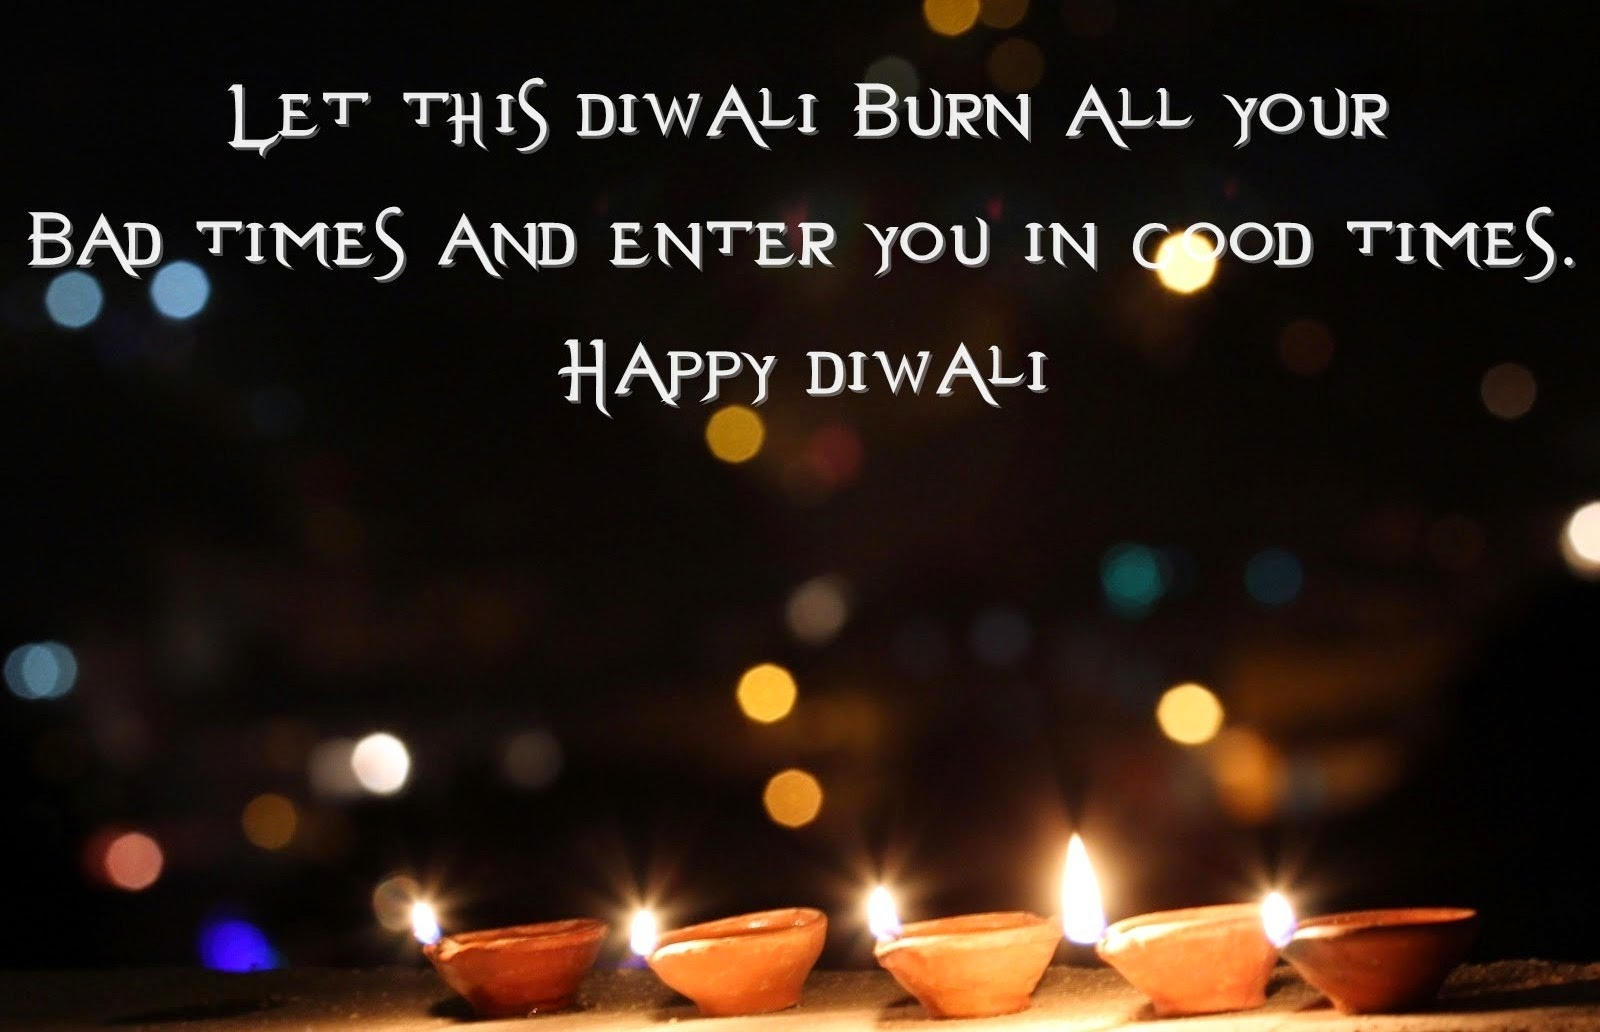 Happy Diwali 2021 Wallpapers, Photo Images Lakshmi Ganesha Deepavali Puja